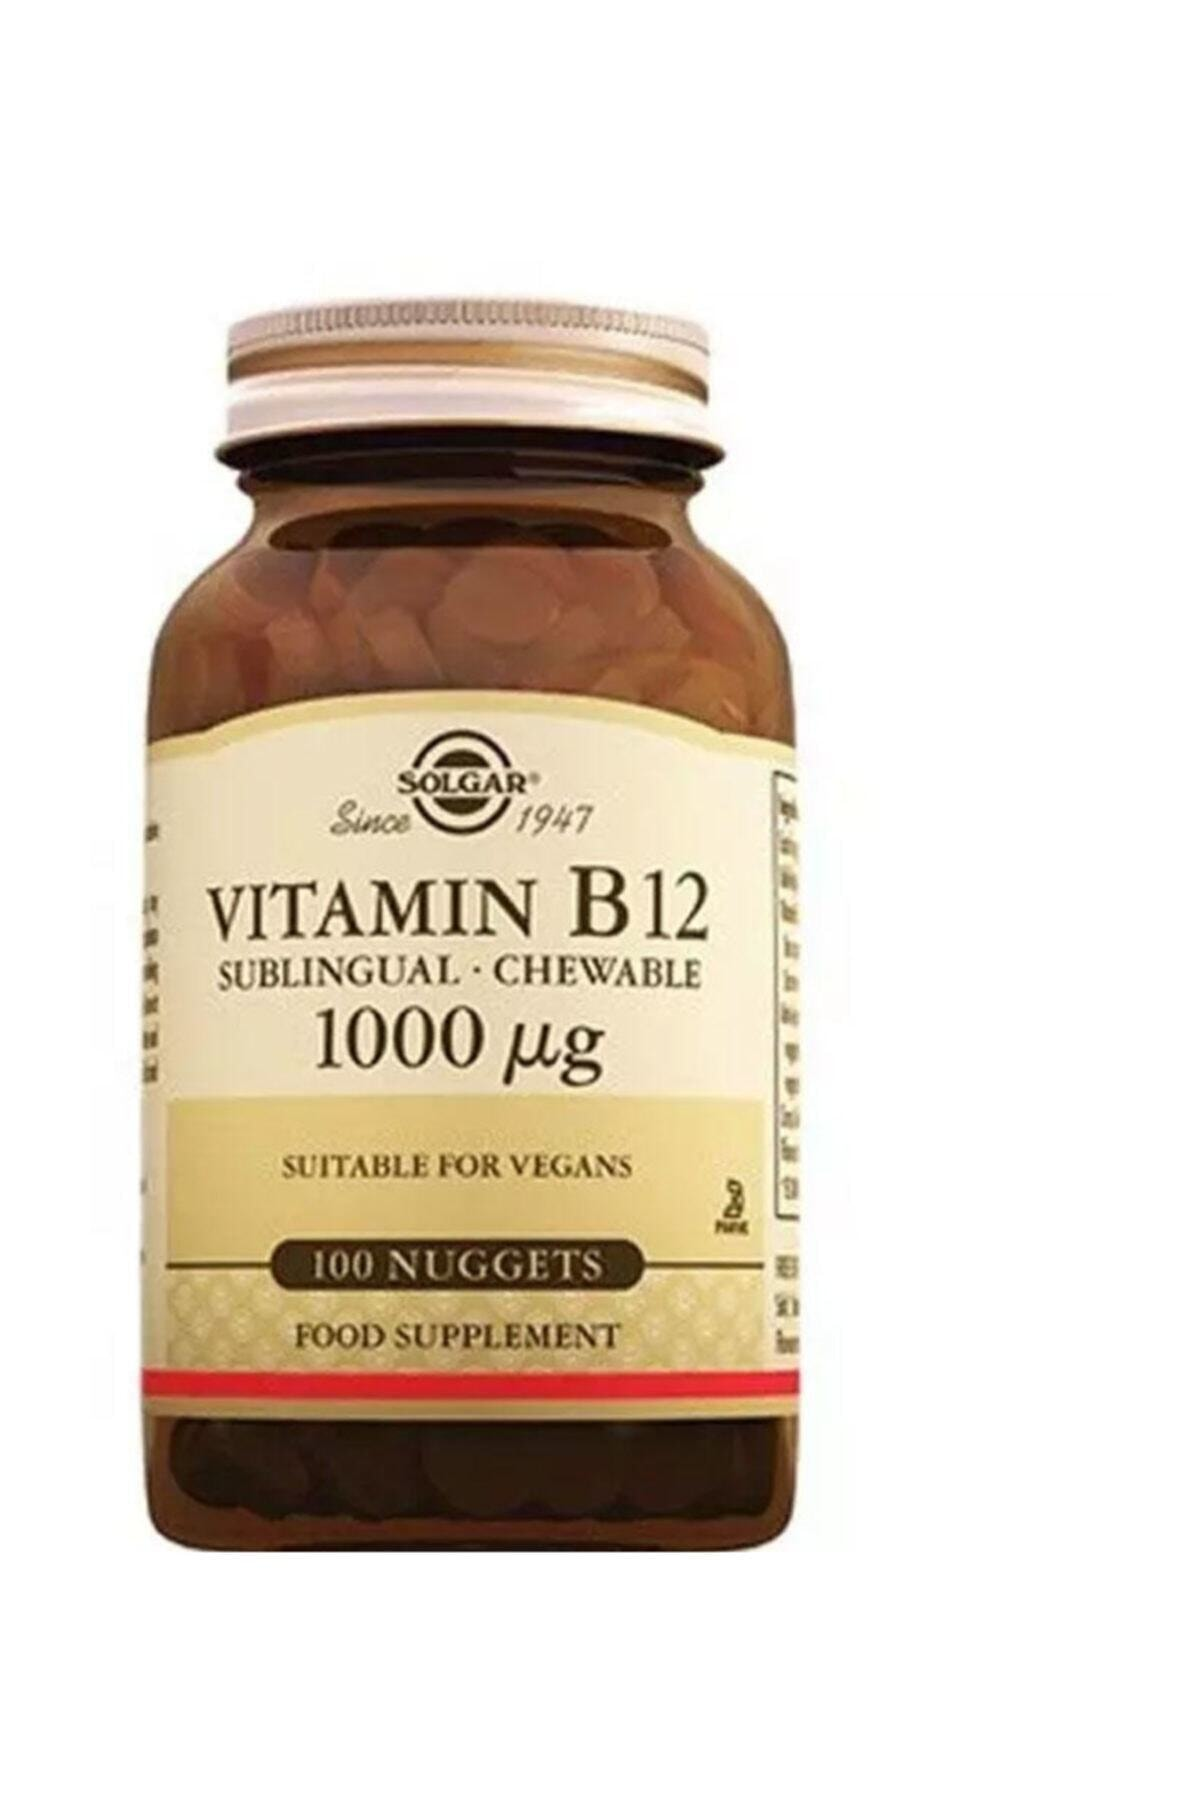 Solgar Vitamin B12 1000 Mcg - 100 Tablet 1